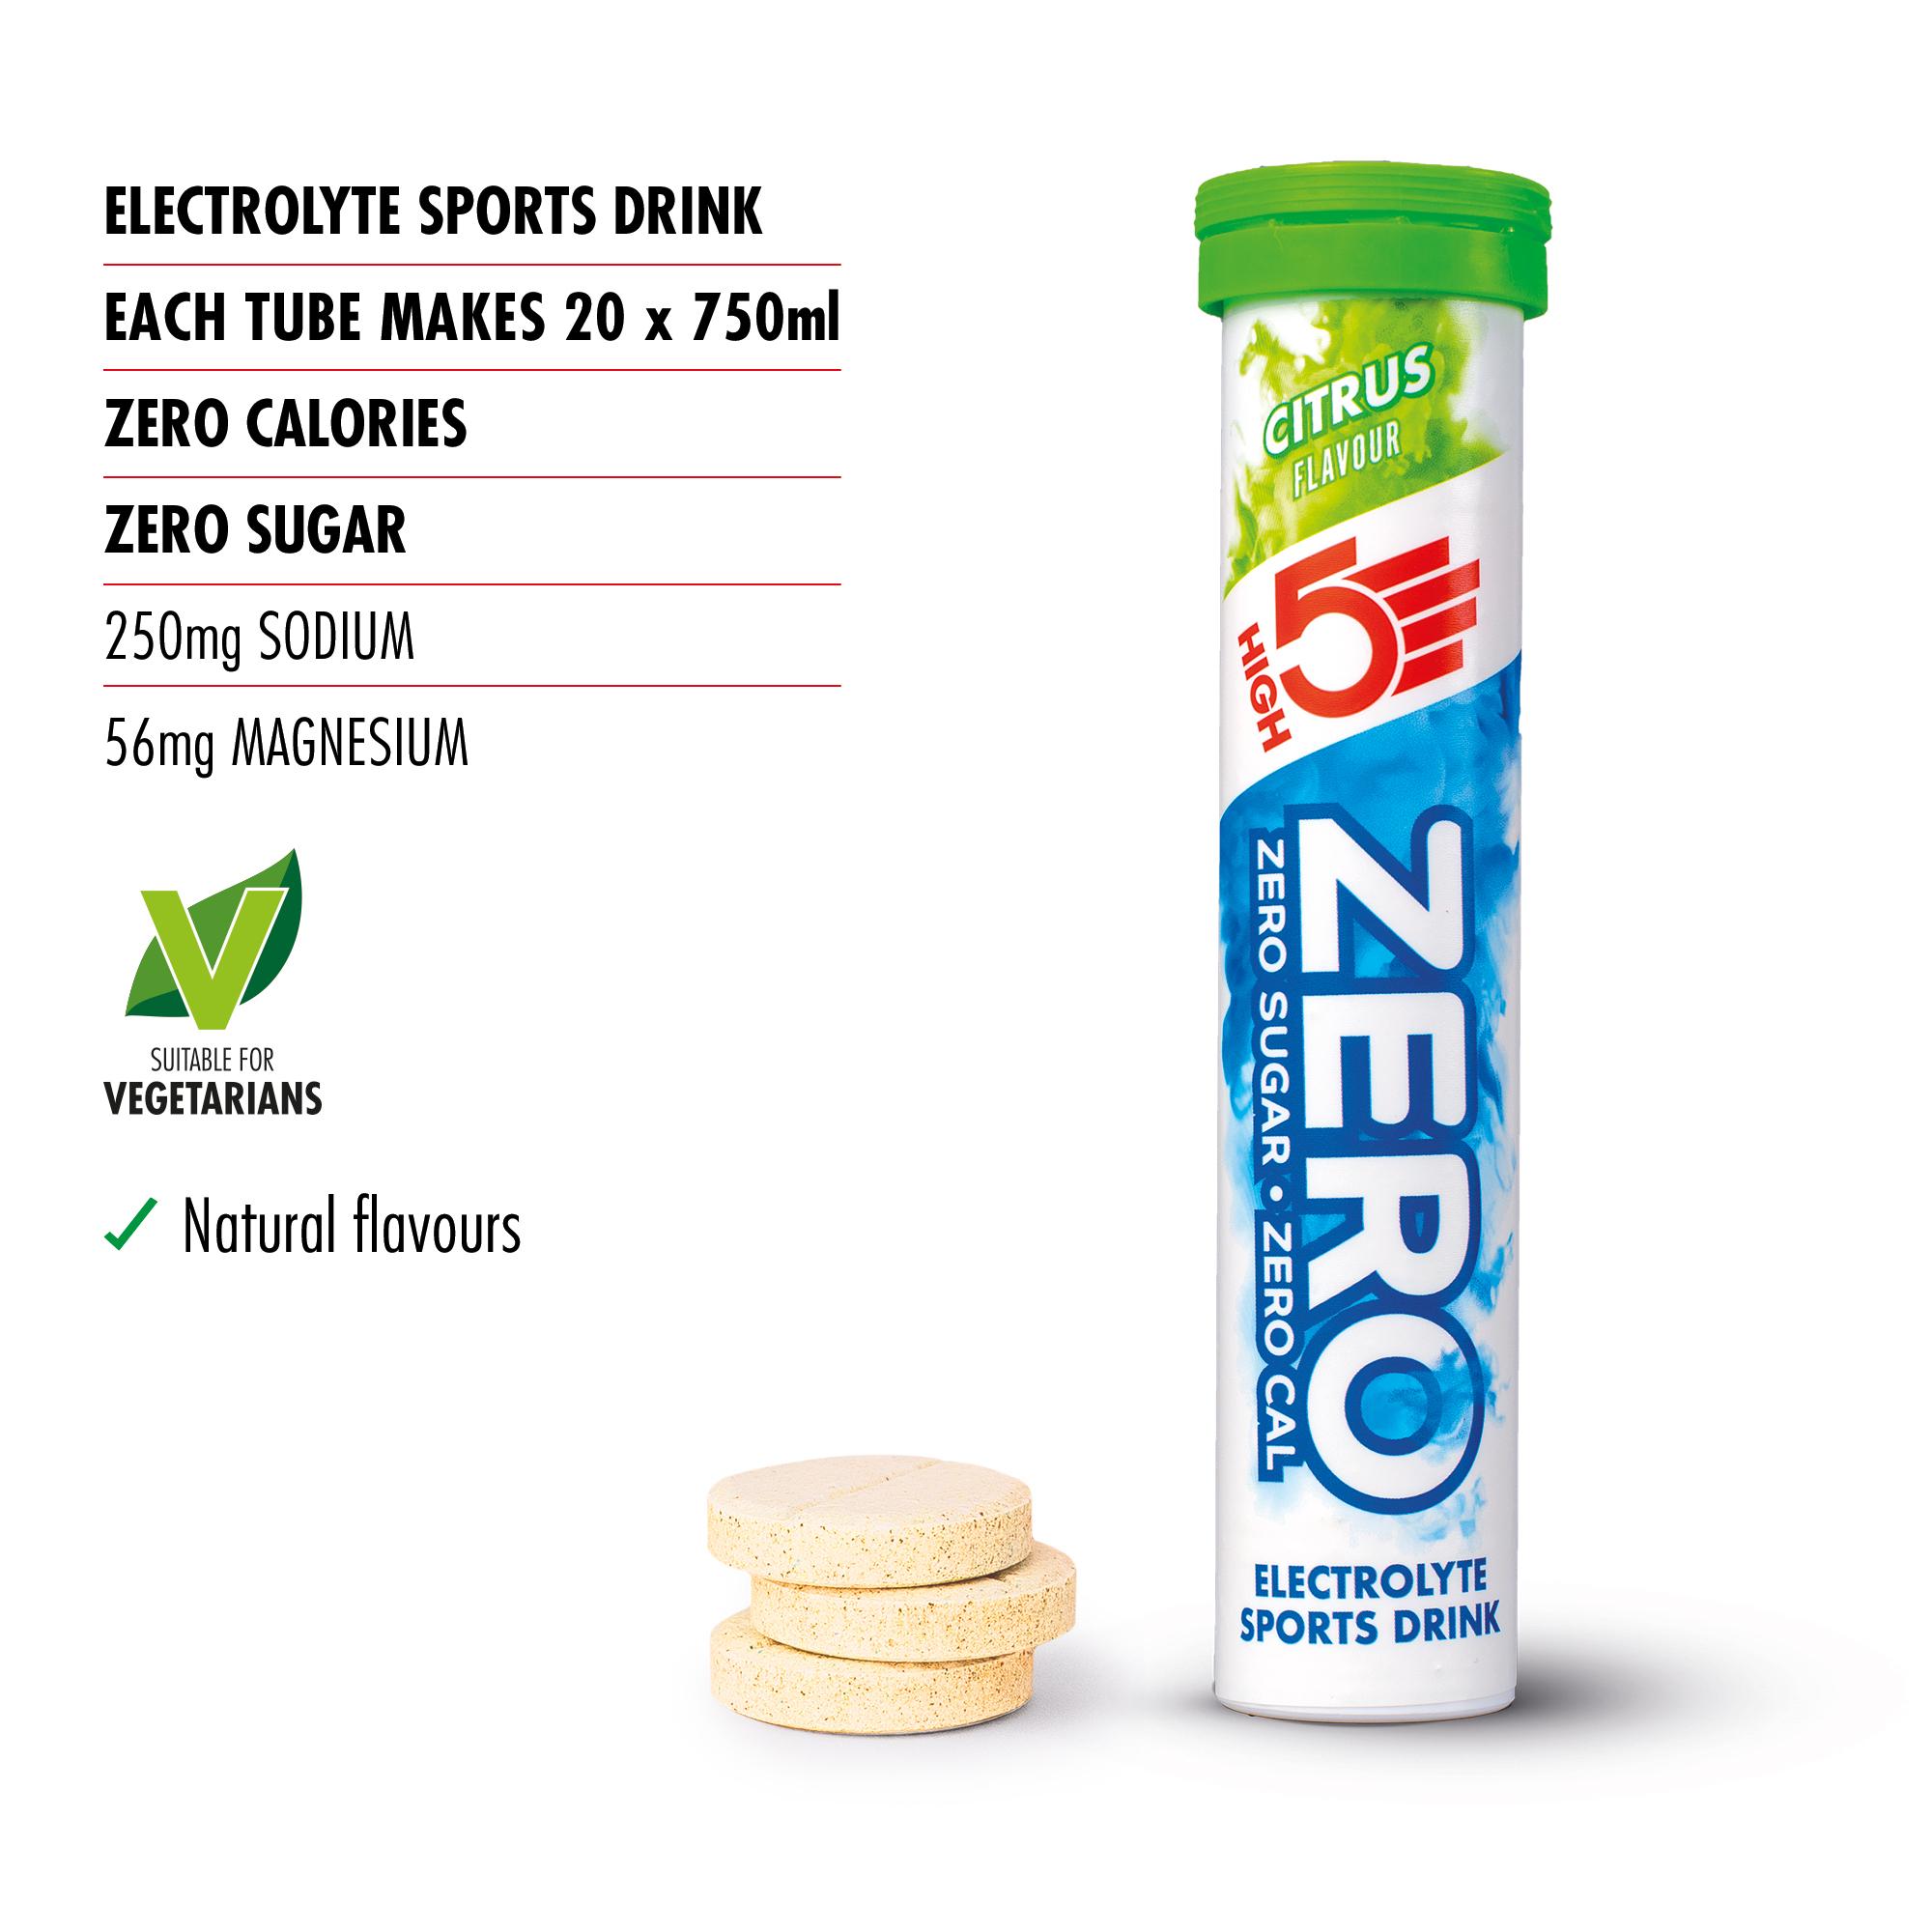 2-HIGH5-Sports-Nutrition-ZERO-Citrus-80g-Highlights_03.jpg